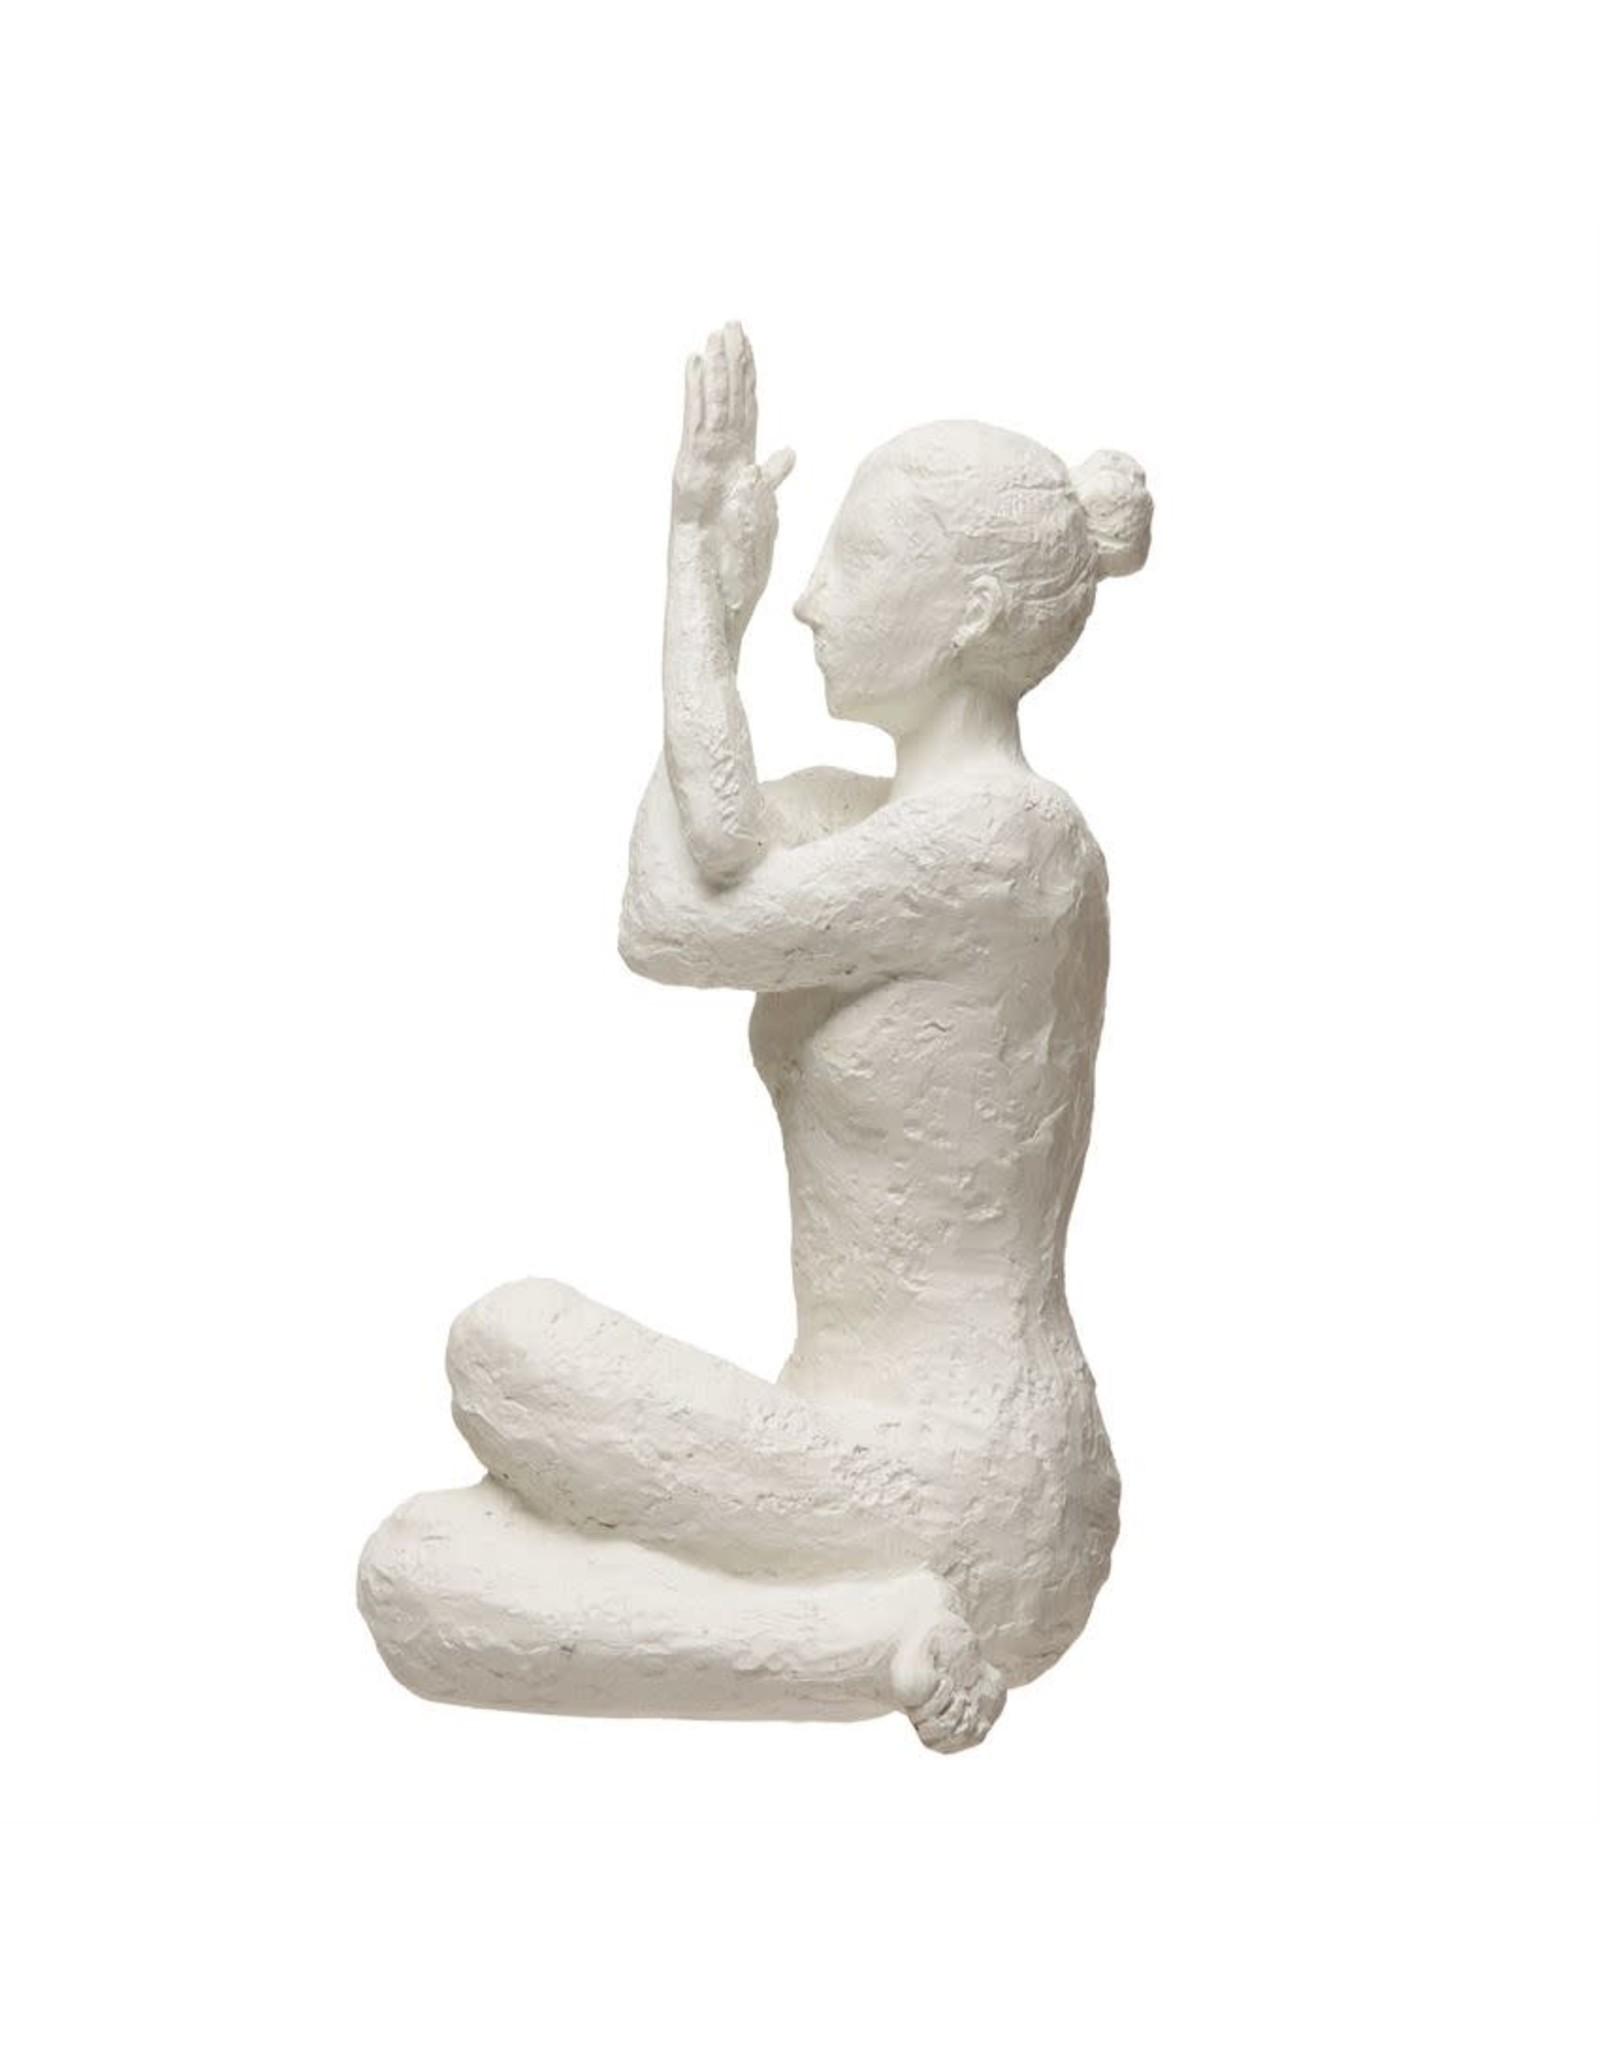 The Florist & The Merchant White Resin Yoga Figure, Volcano Finish